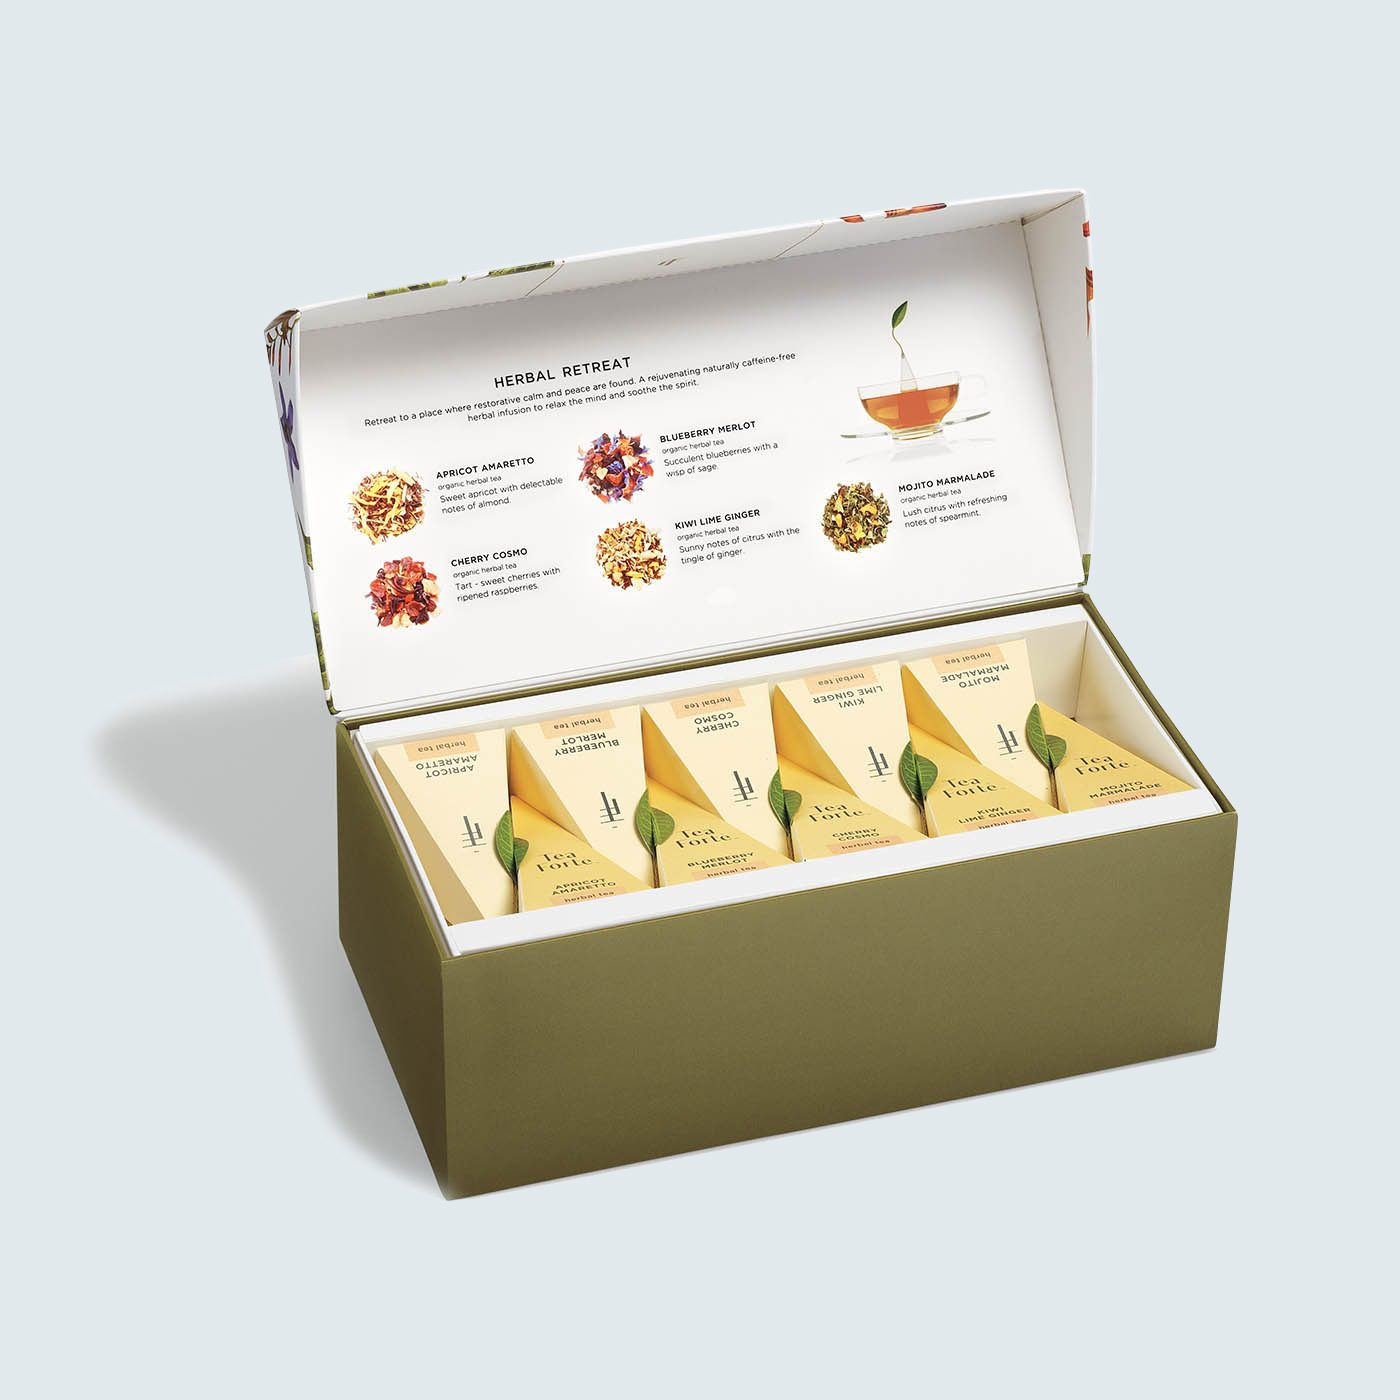 Tea Forté Presentation Box Herbal Retreat